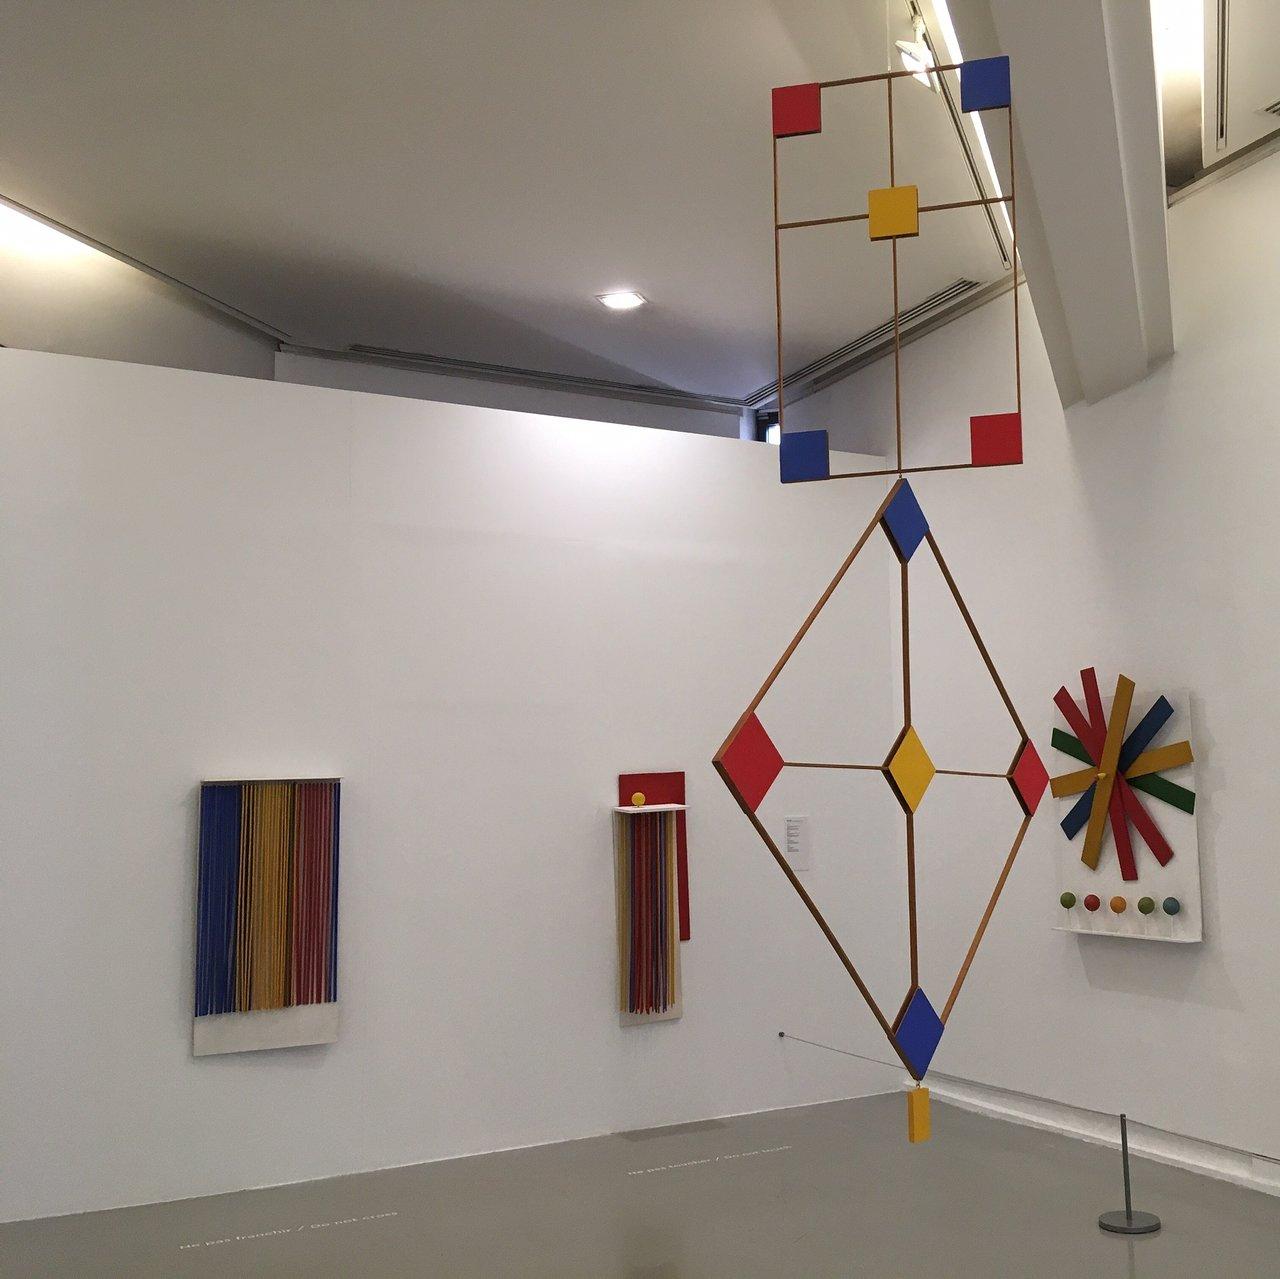 Musée D'art Moderne Et D'art Contemporain - Nice - Musée D ... concernant Salon De Jardin Casino